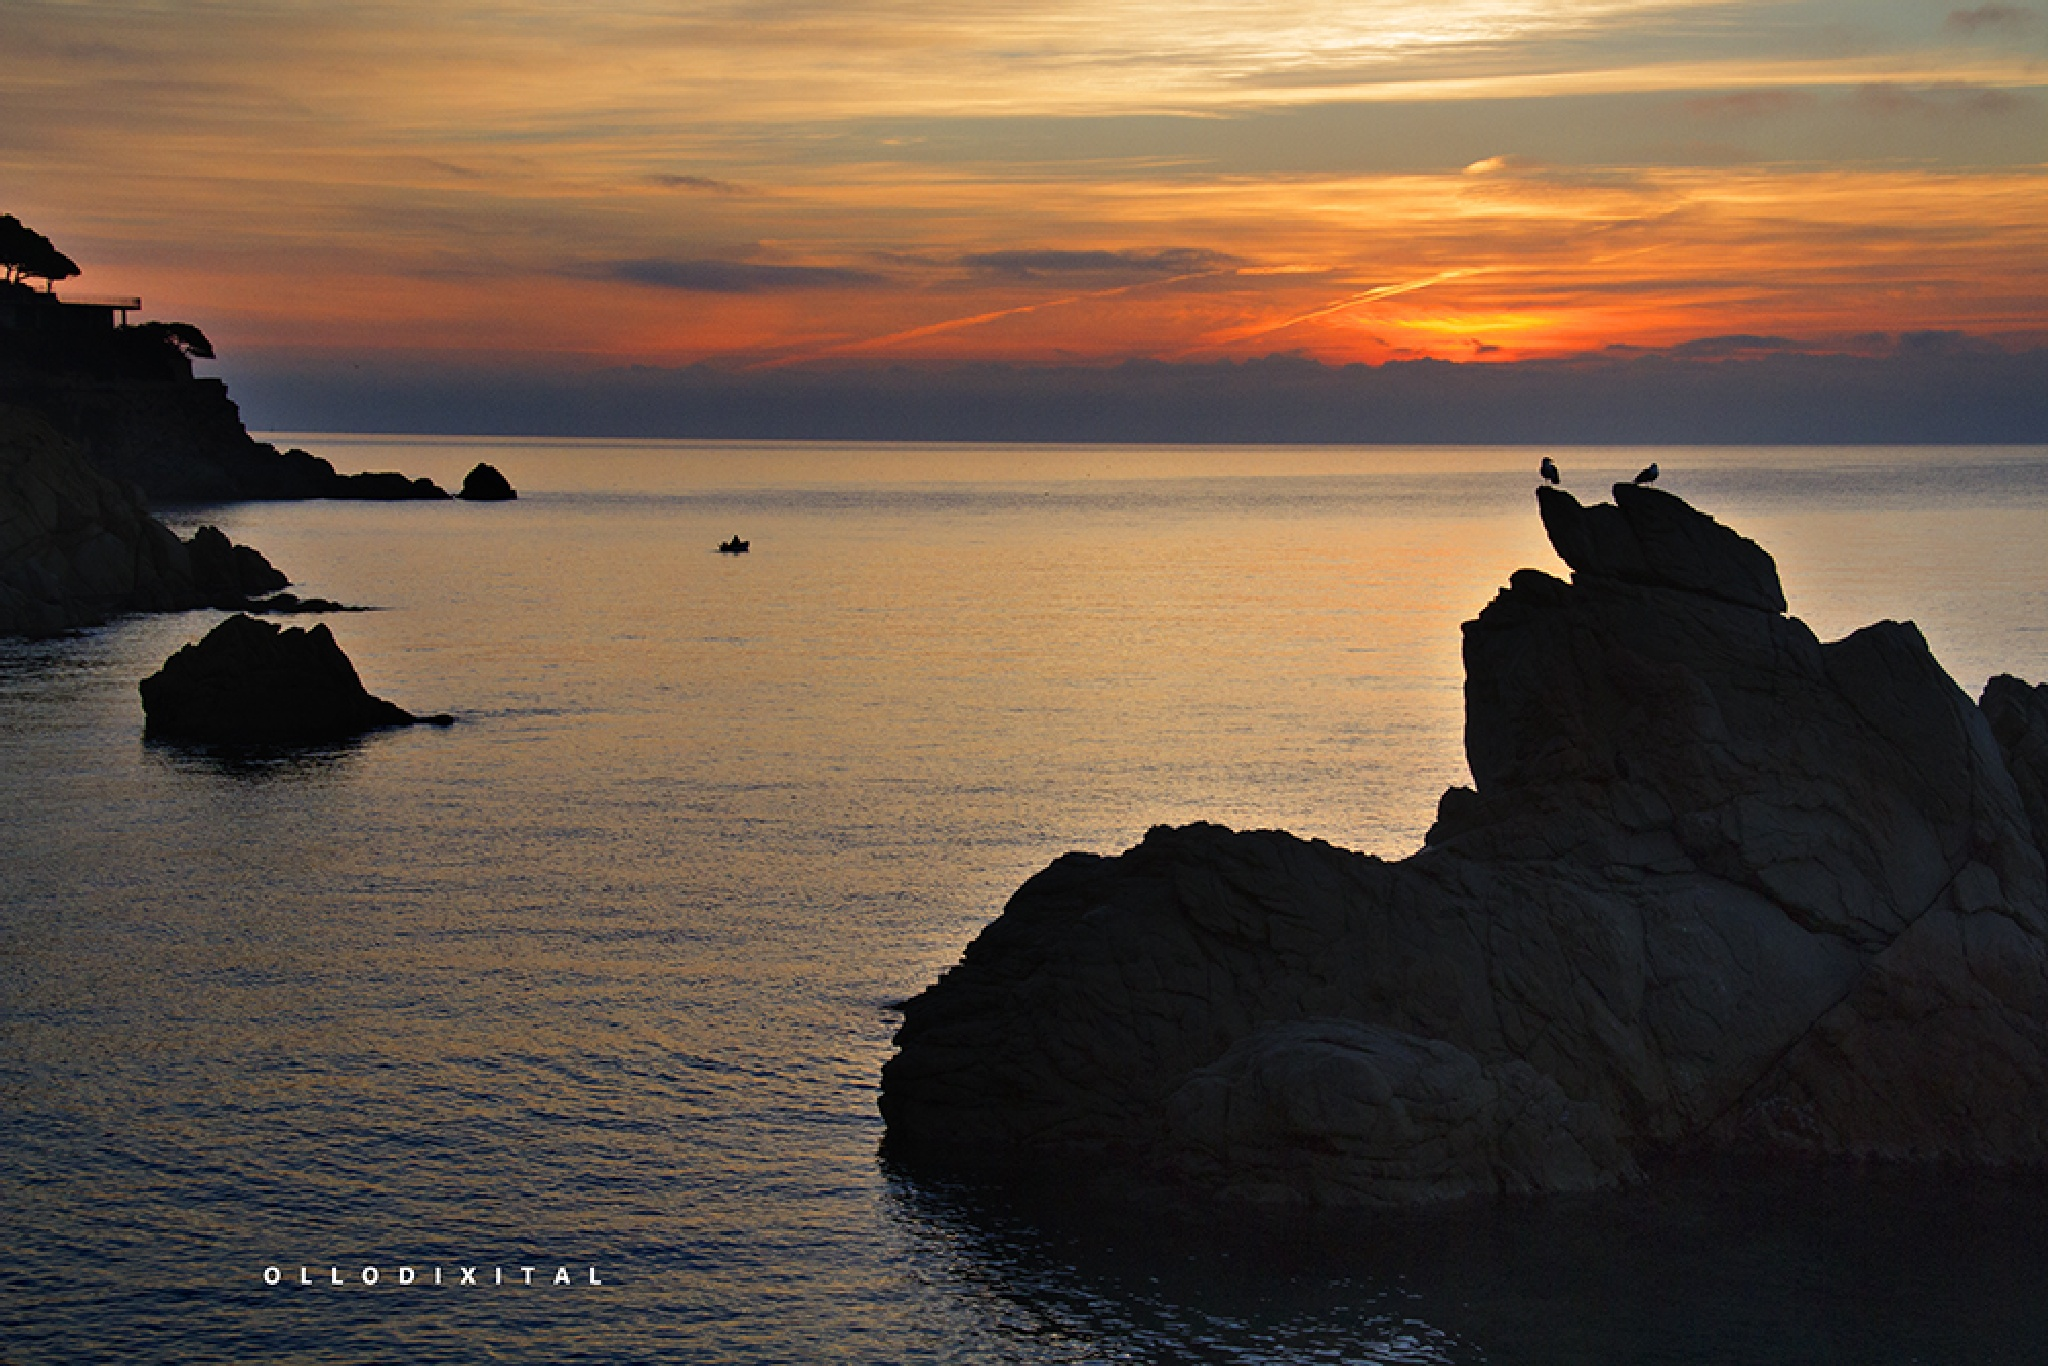 Sunrise Lloret by OlloDixital